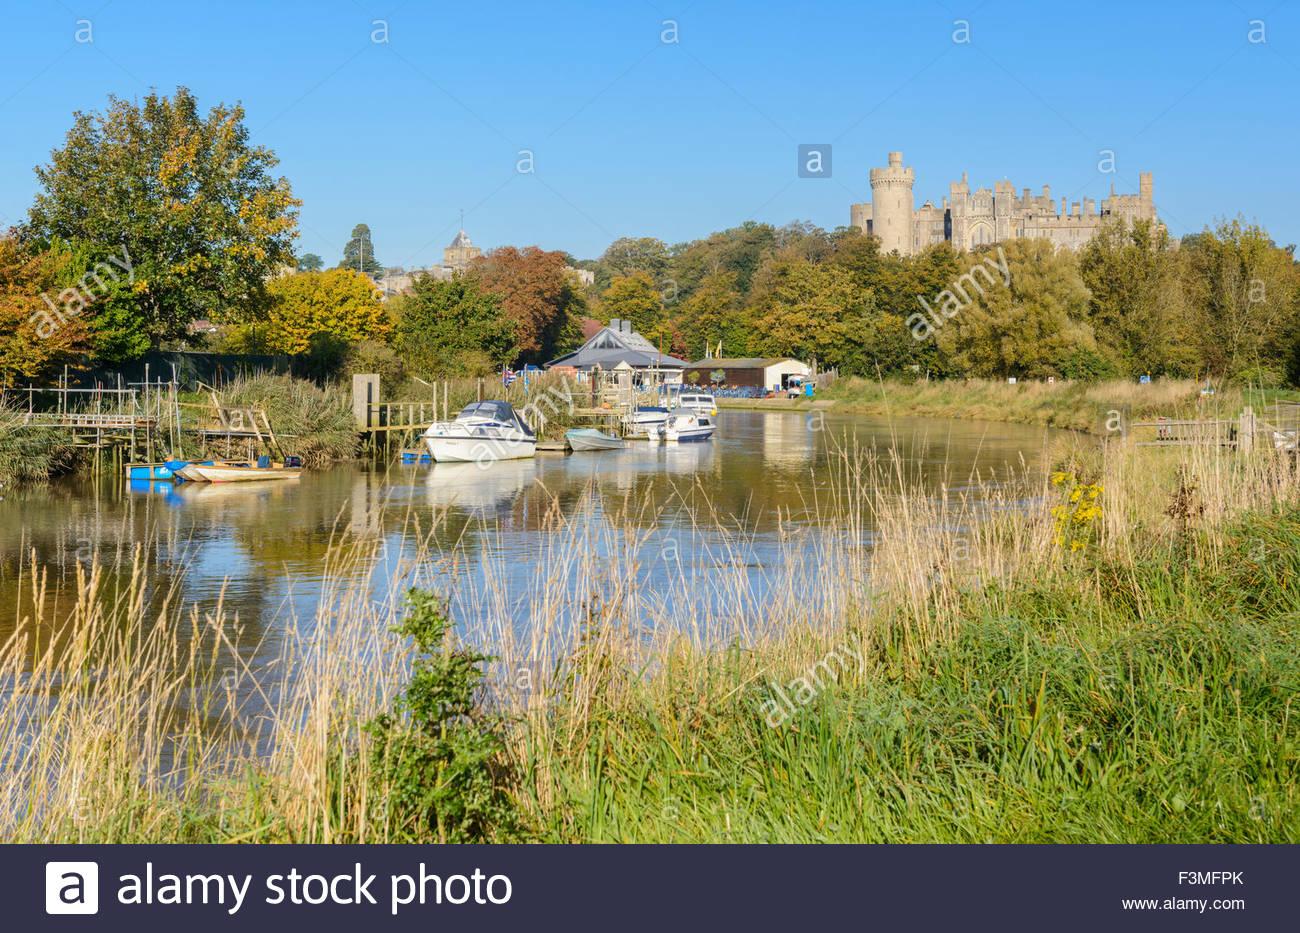 the-riverside-in-arundel-with-arundel-ca